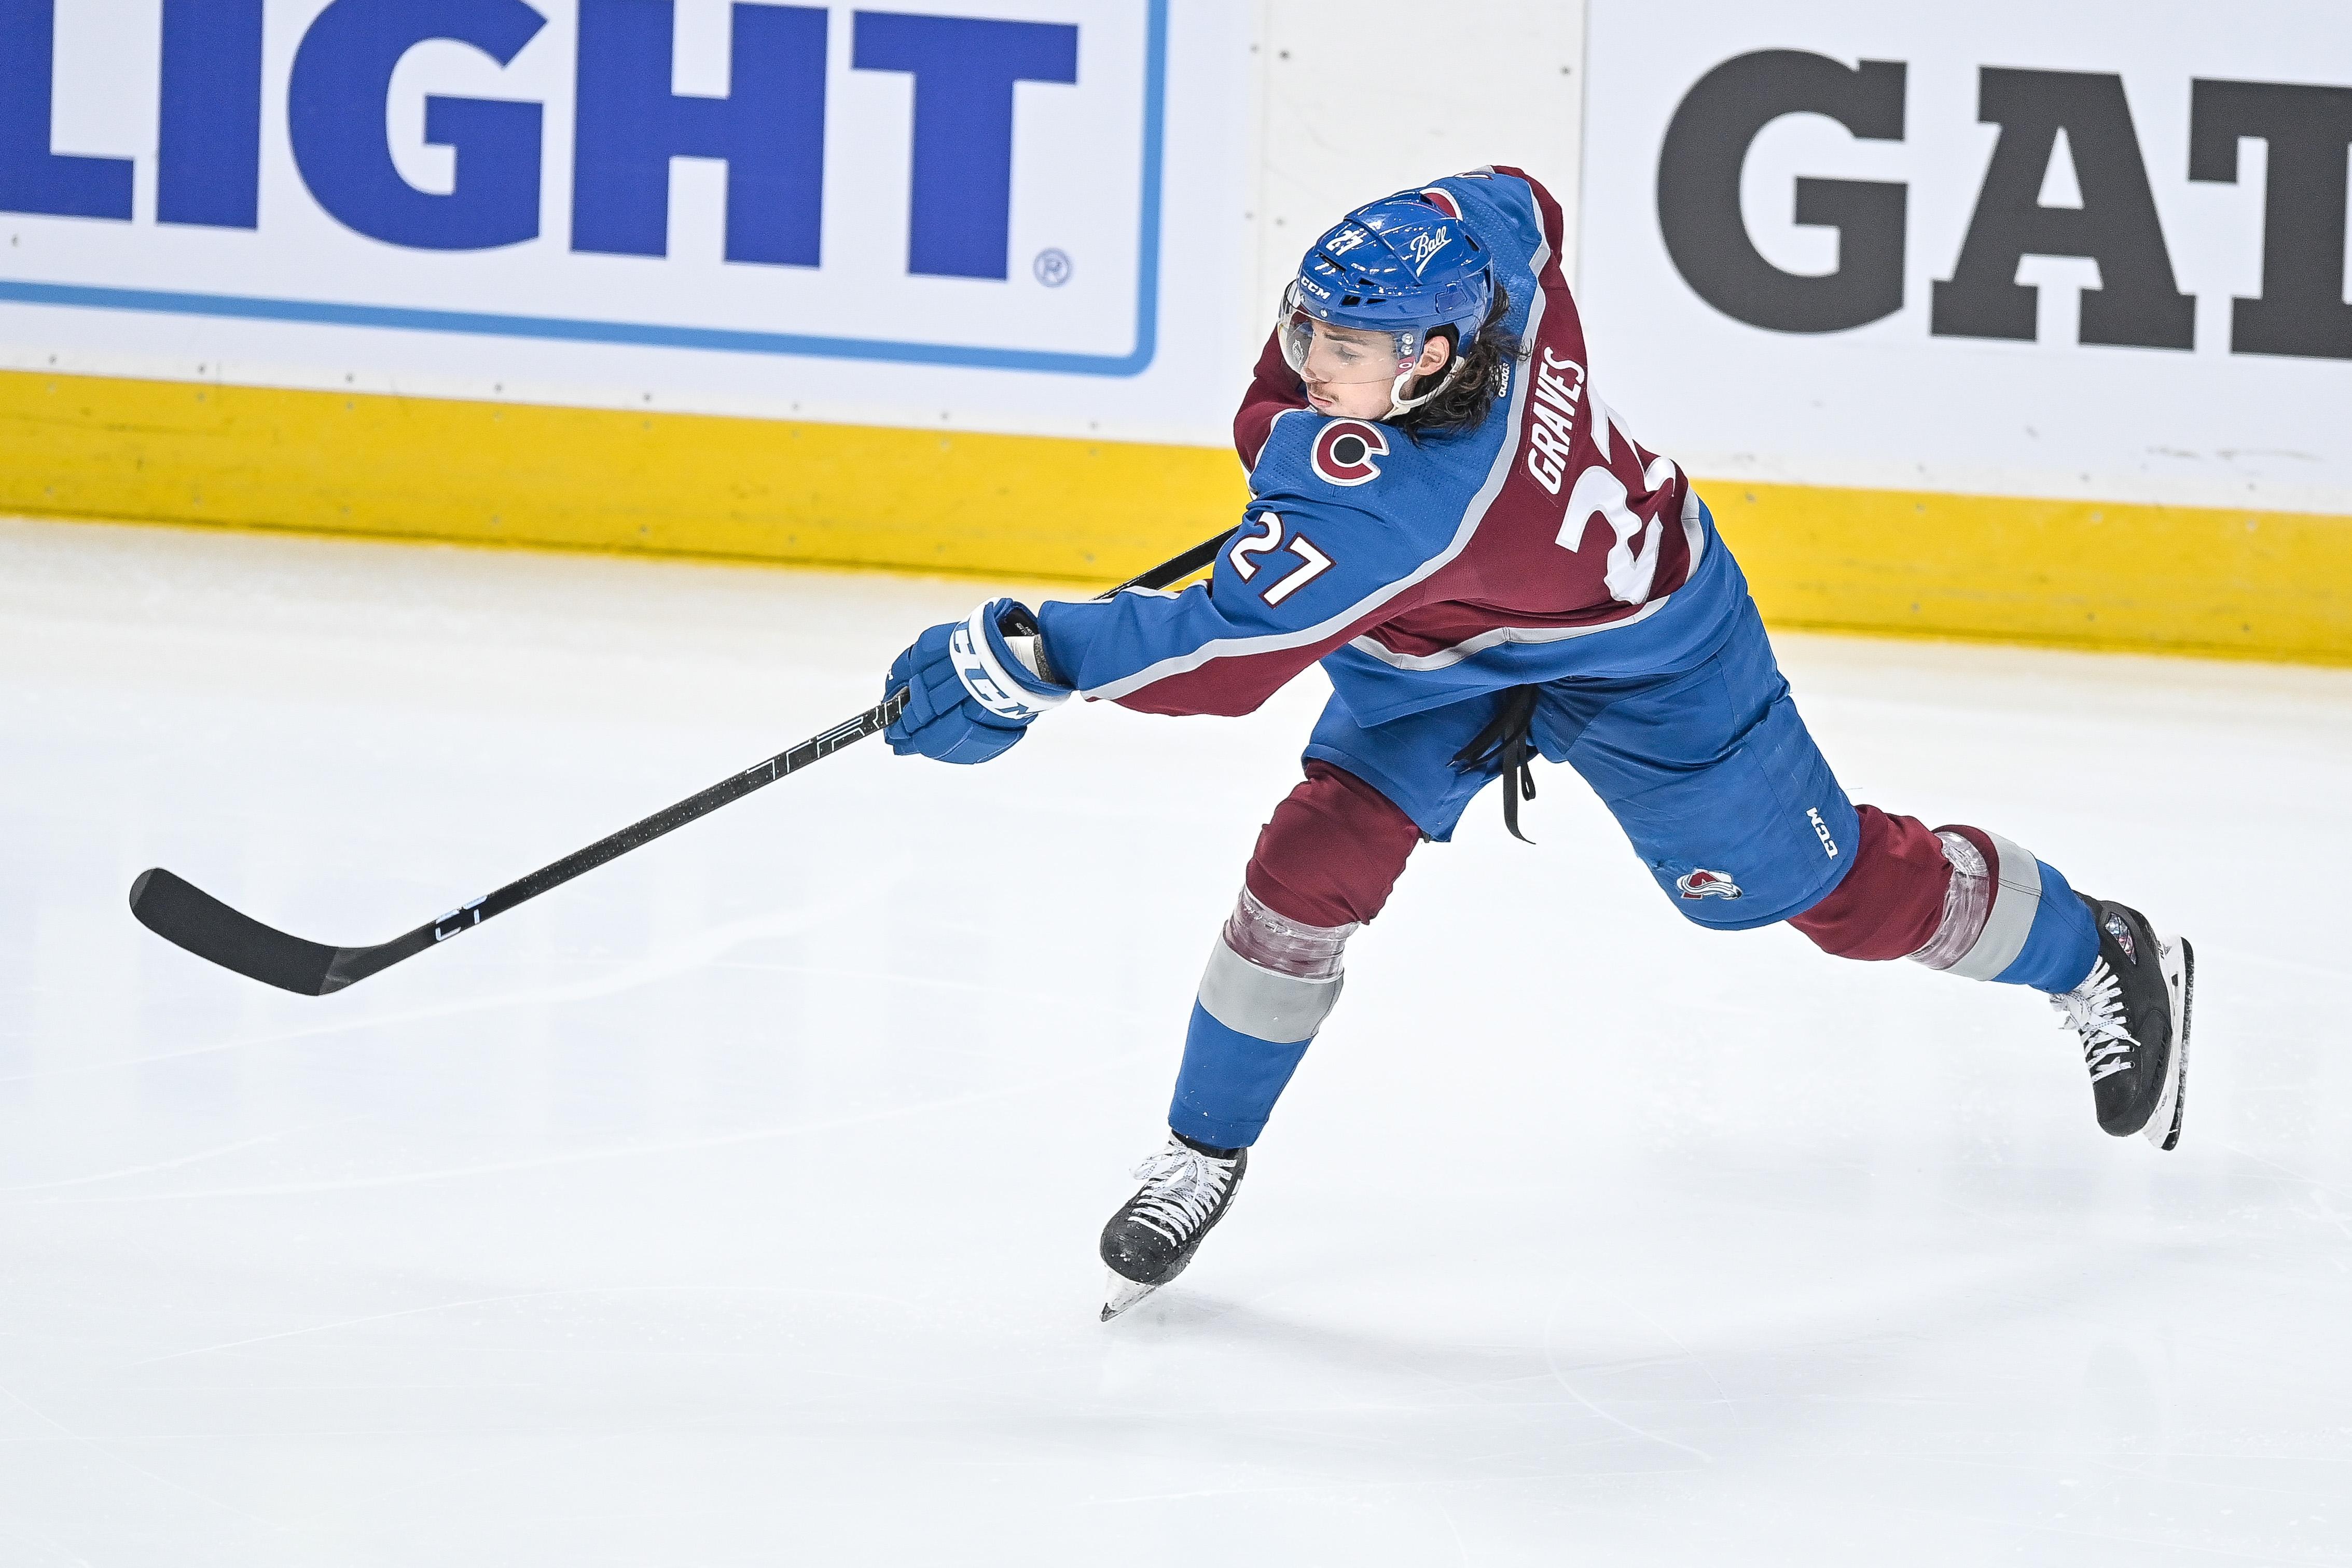 NHL: JUN 08 Stanley Cup Playoffs Second Round - Golden Knights at Avalanche